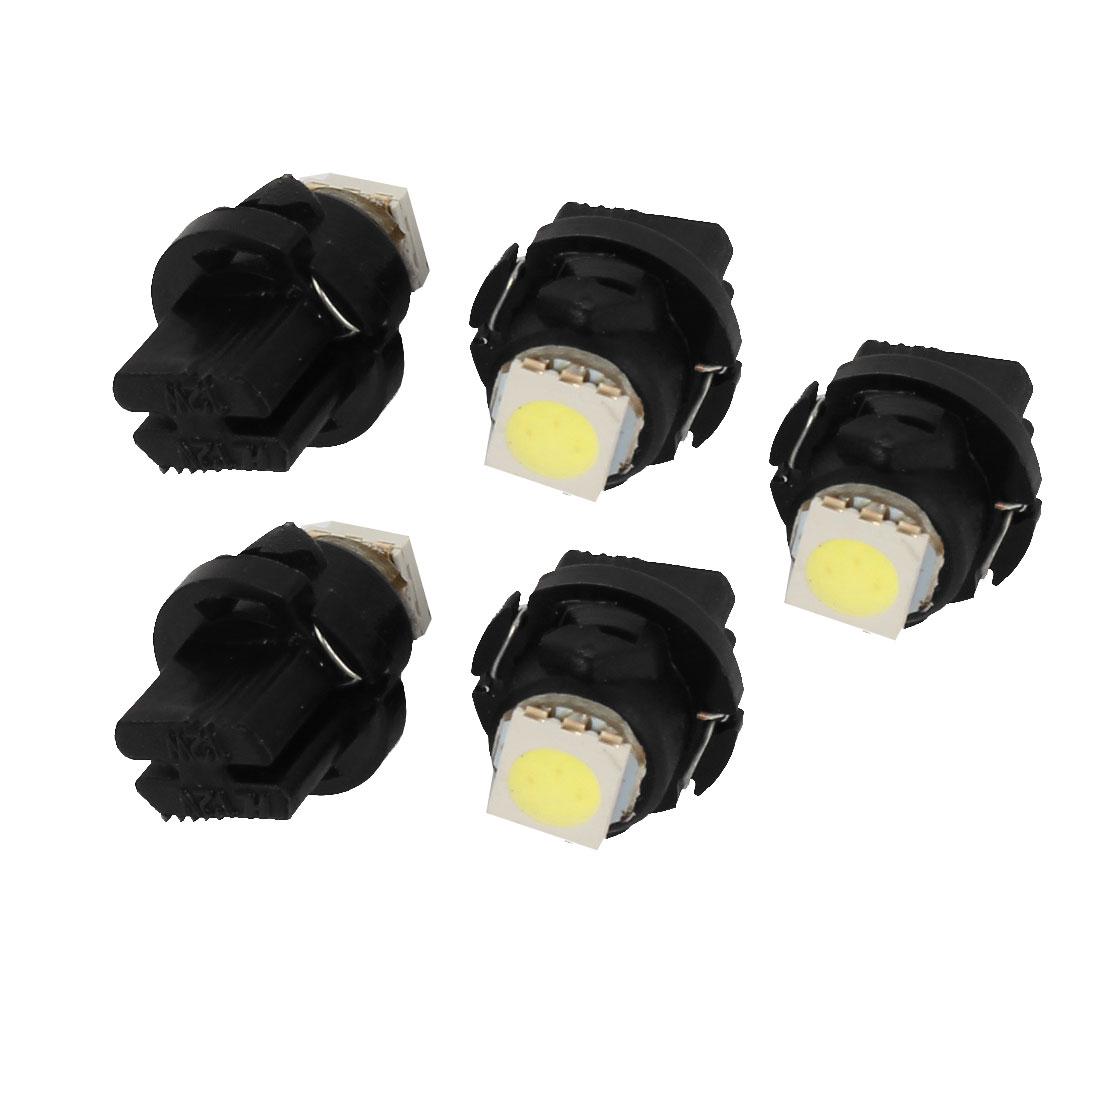 5 Pcs T5 5050 LED Truck Van Dash Gauge Wedge Lamps Lights Bulbs White internal